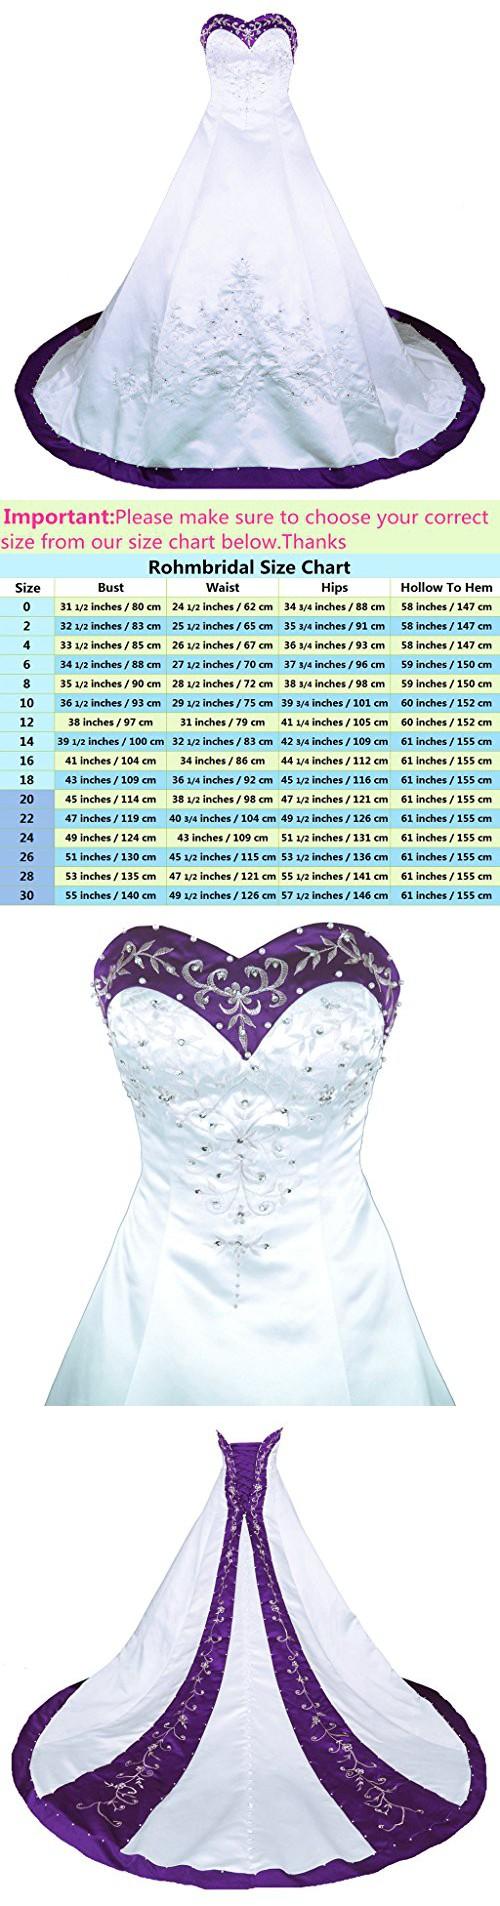 Rohmbridal sweetheart aline wedding dress bridal gown size white